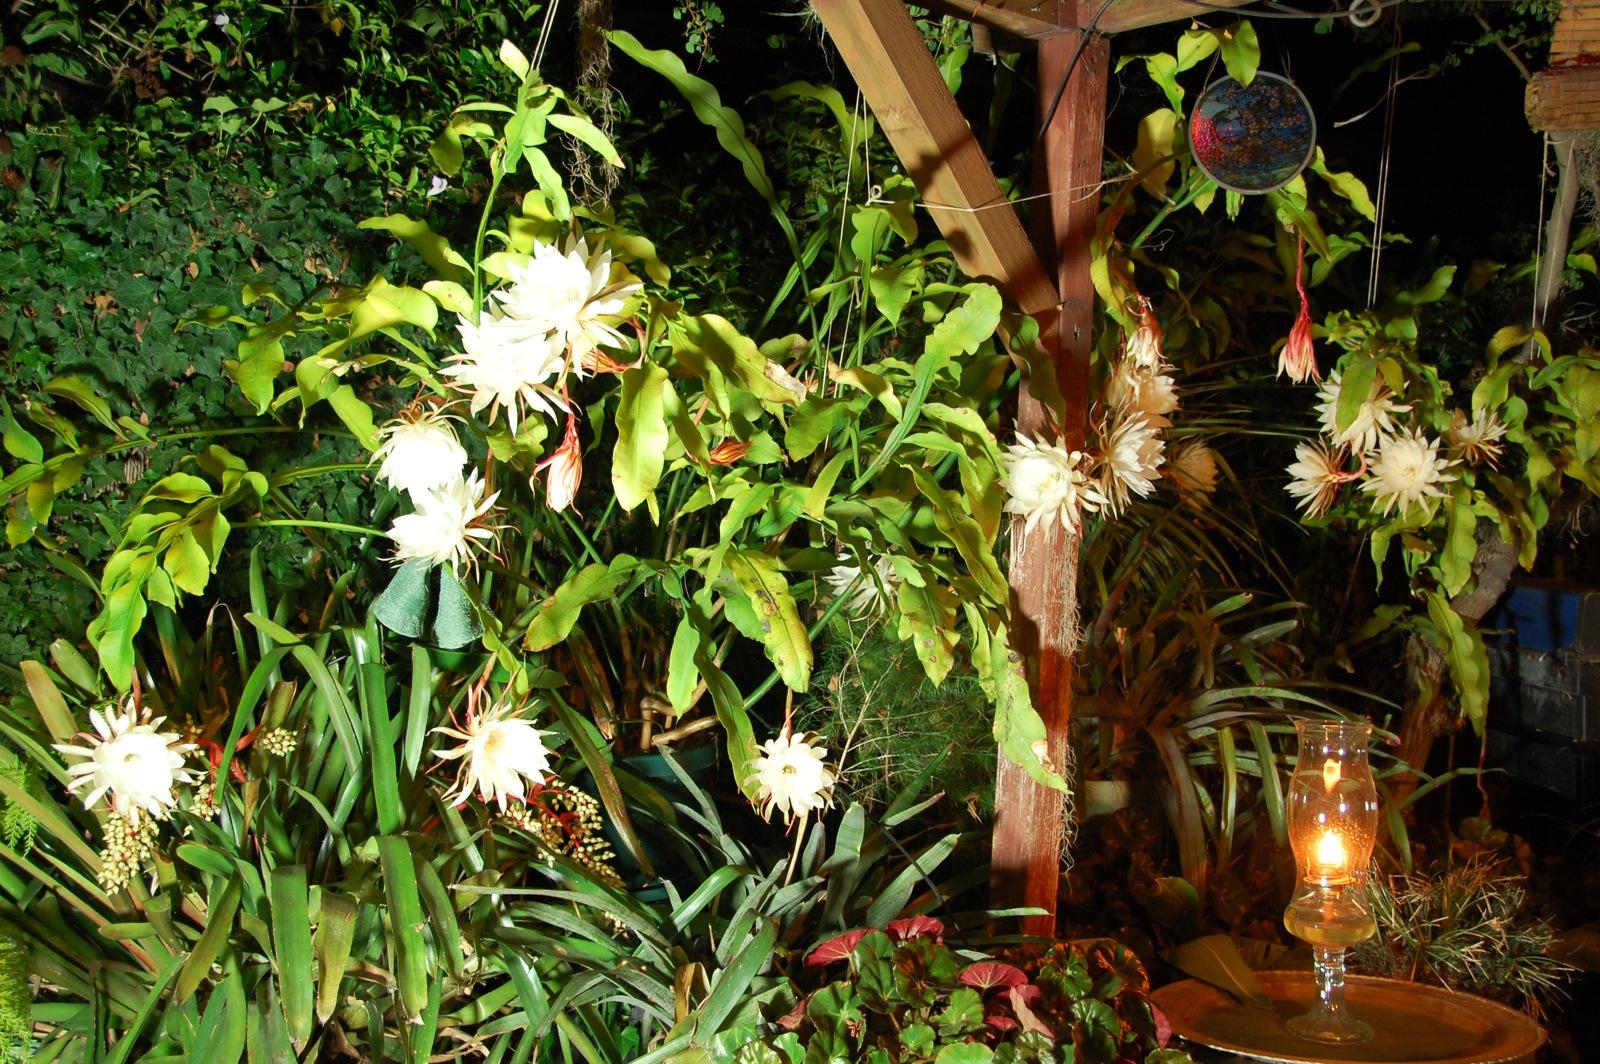 Click image for larger version  Name:1600 6:20:08 cereus bloom.jpg Views:56 Size:724.5 KB ID:62732